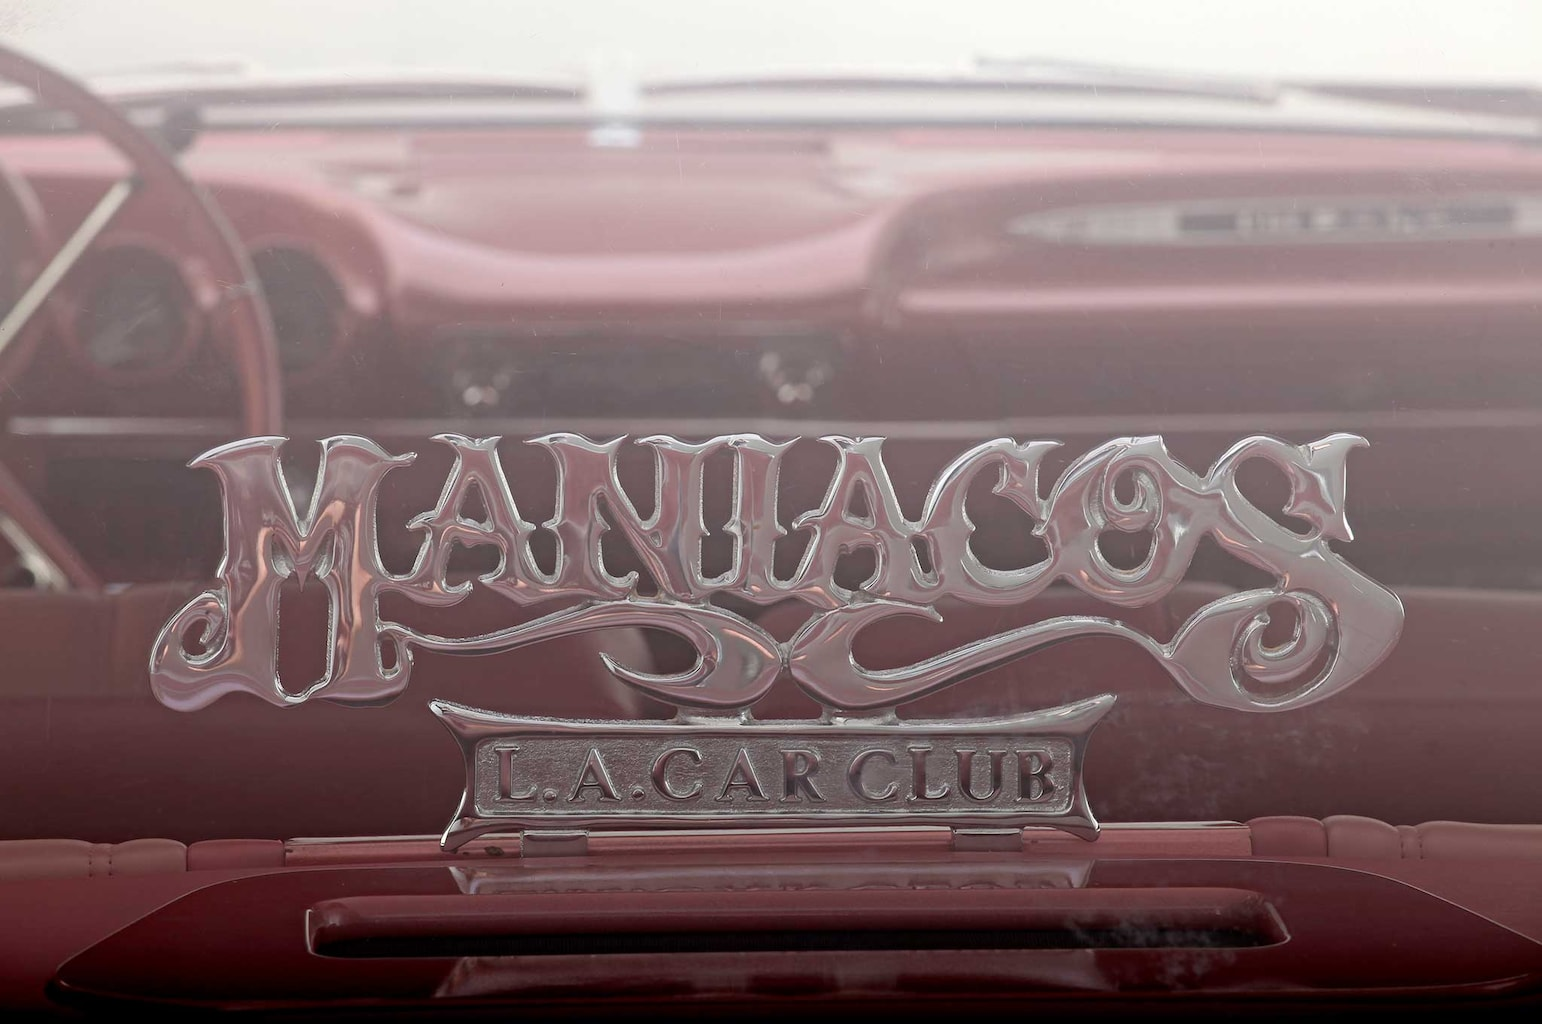 1959 chevrolet impala maniacos club plaque 027